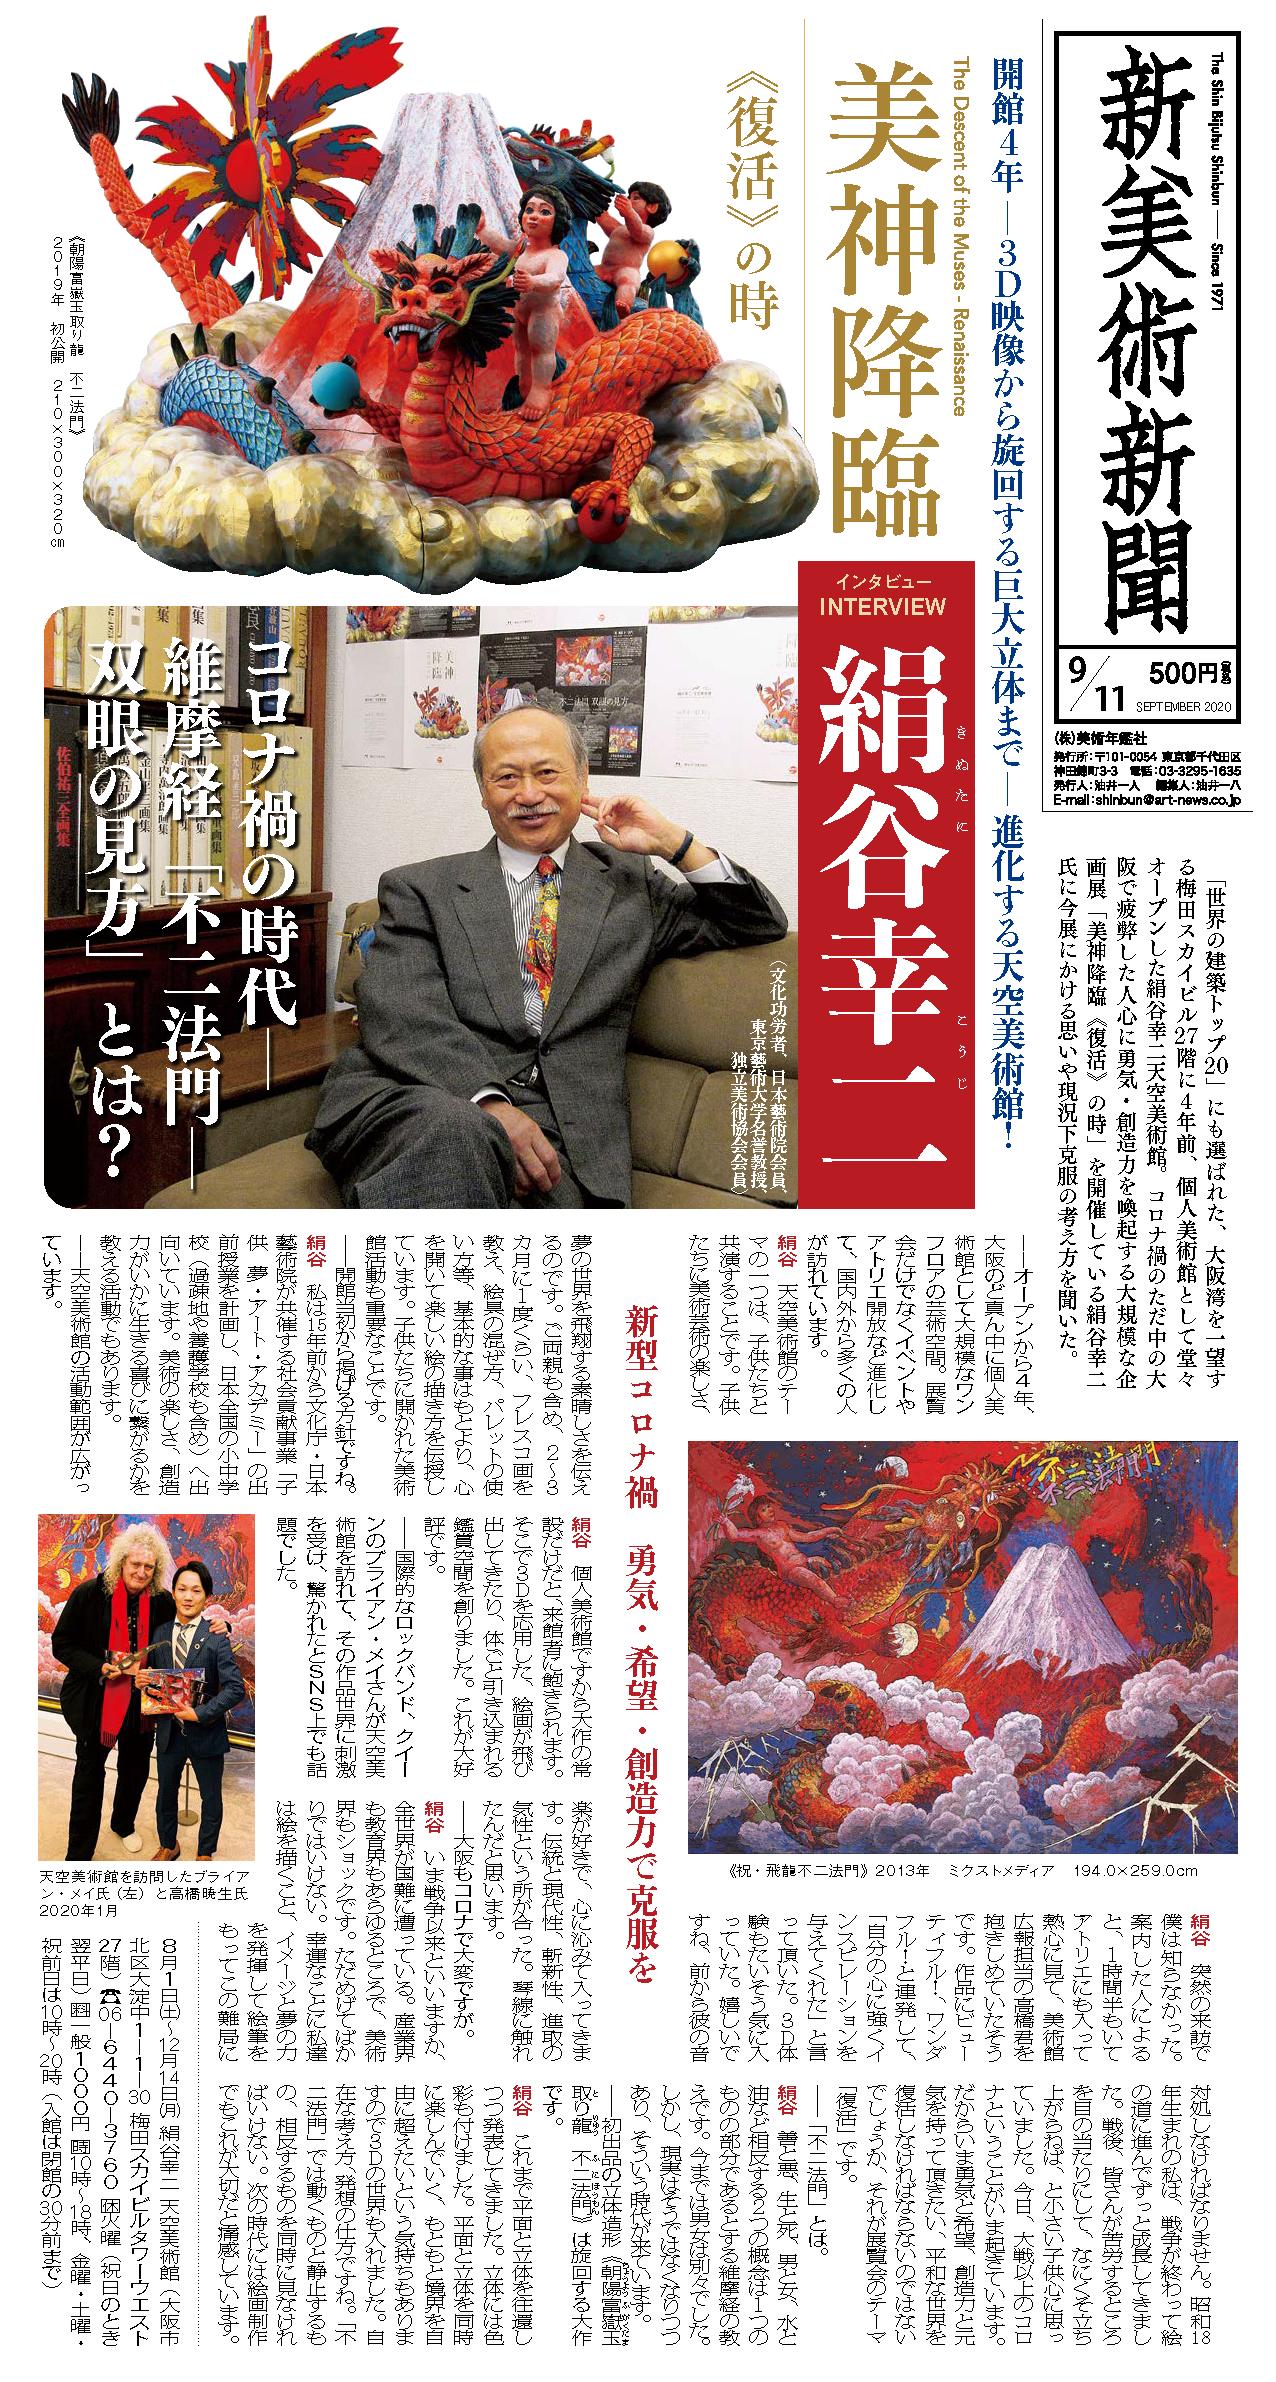 https://kinutani.jp/news/about/2020100801.jpg